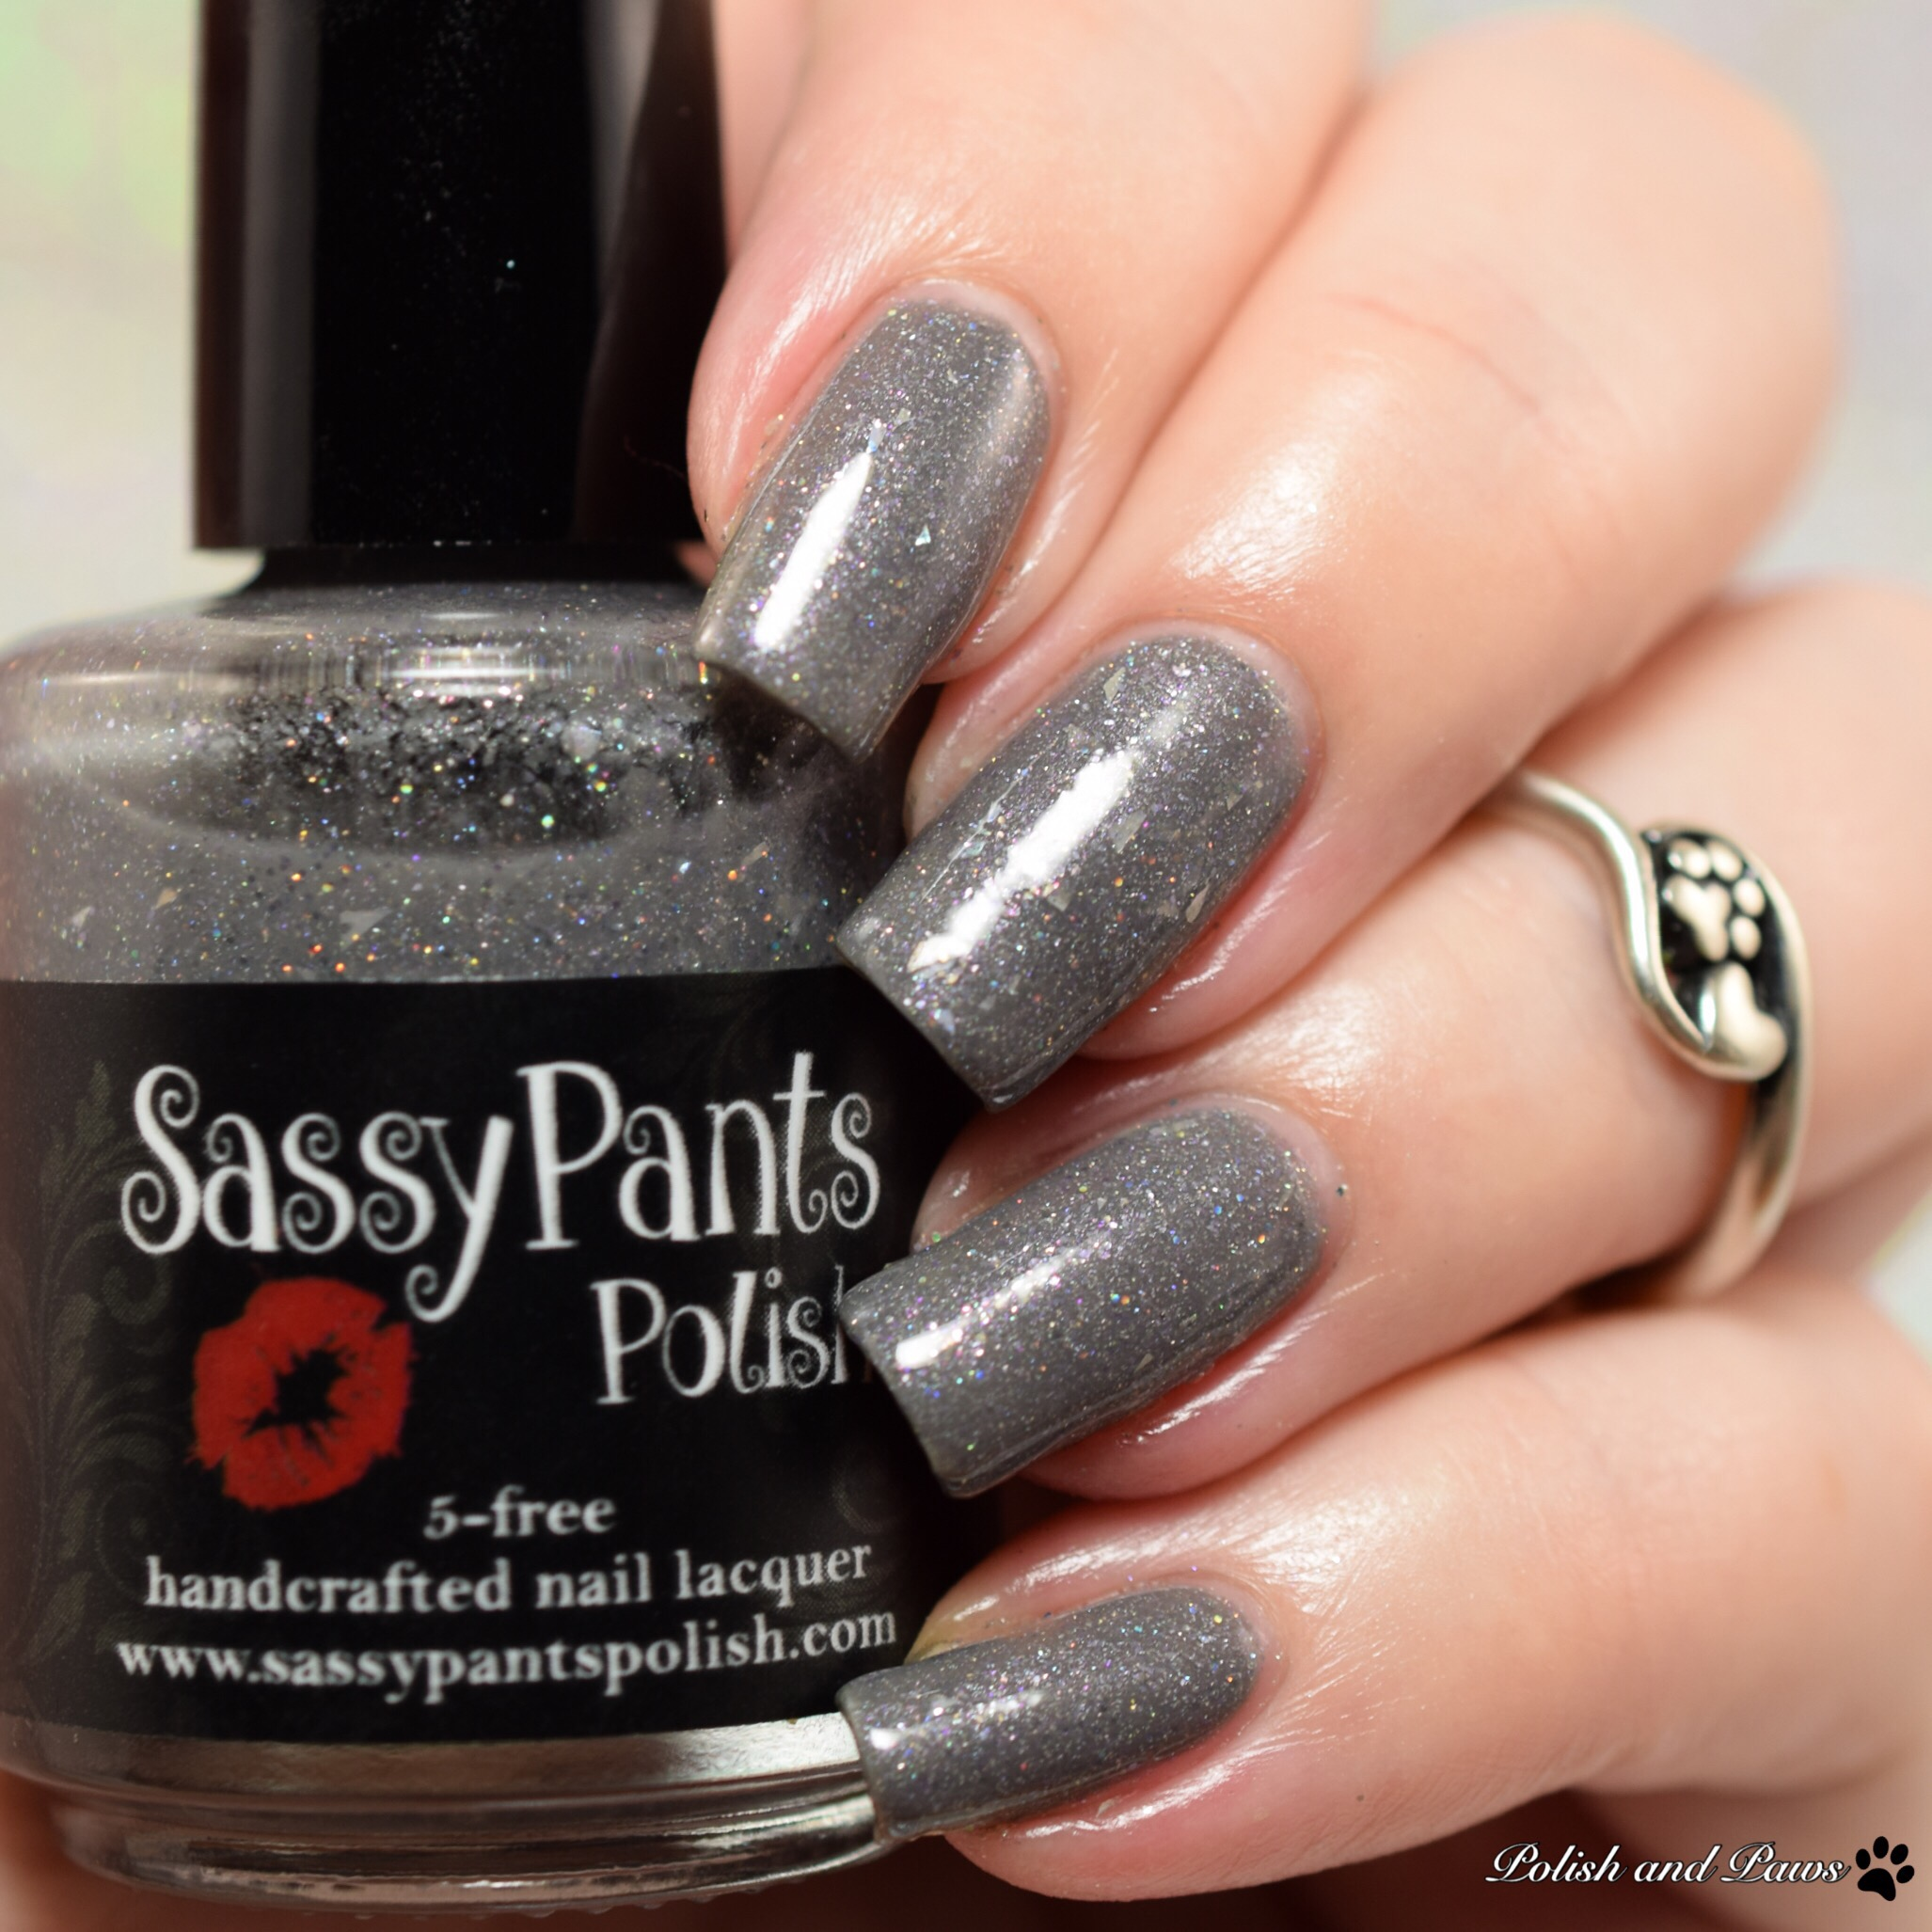 Sassy Pants Polish Not Even a Mouse